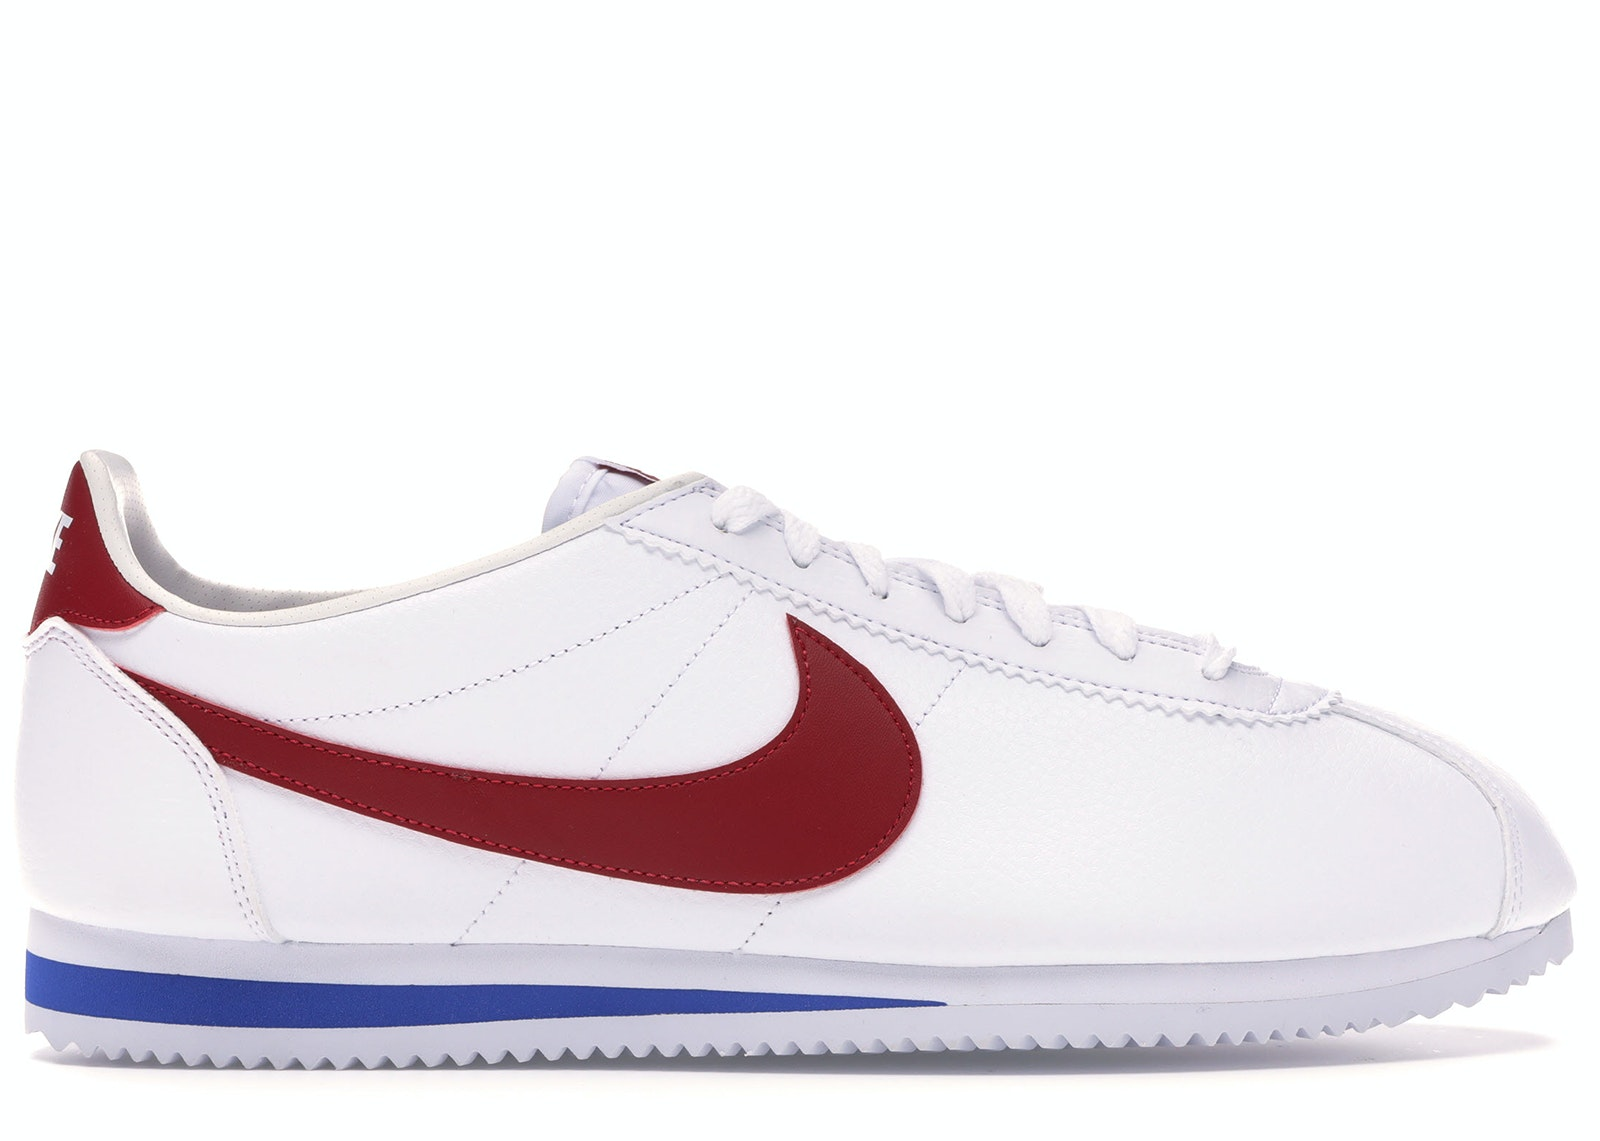 Nike Classic Cortez Forrest Gump (2018)